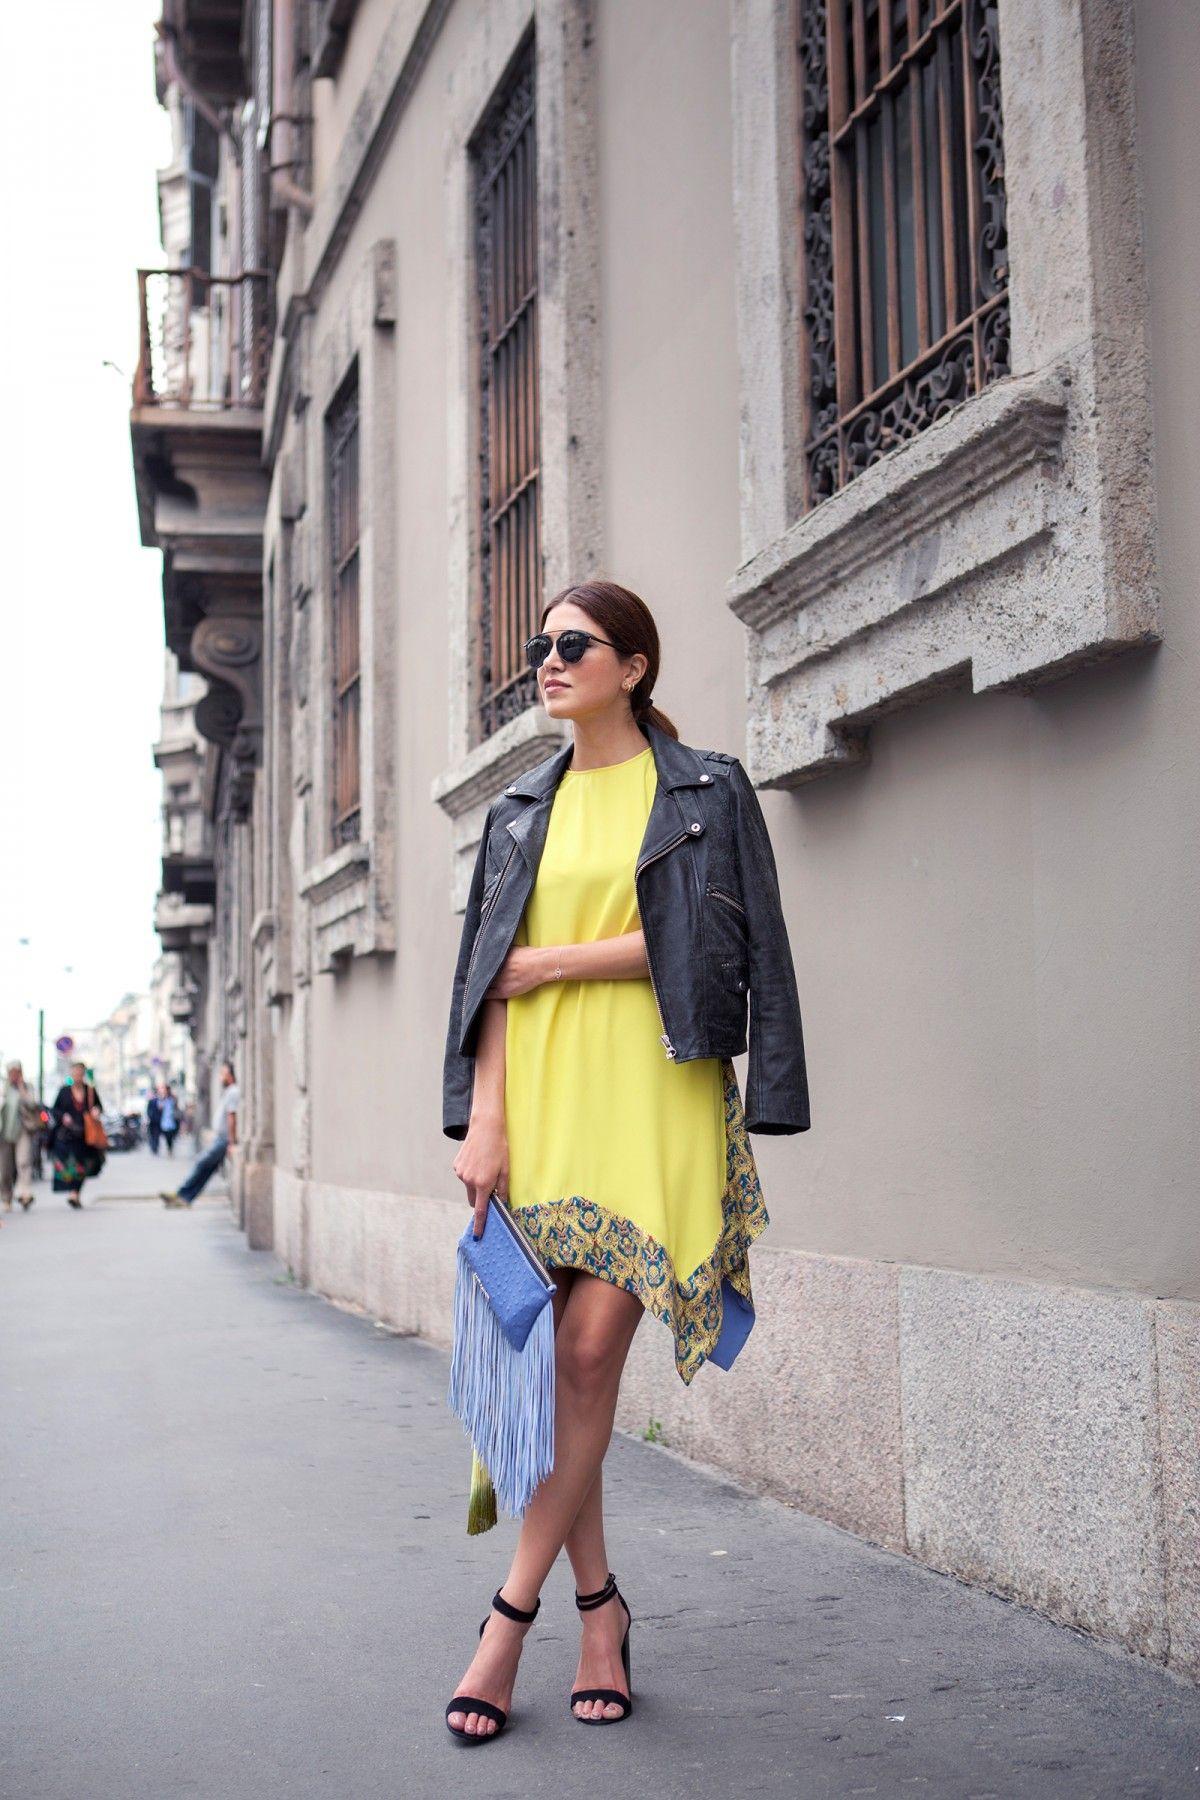 Milan Fashion Week: Just Cavalli - Negin Mirsalehi